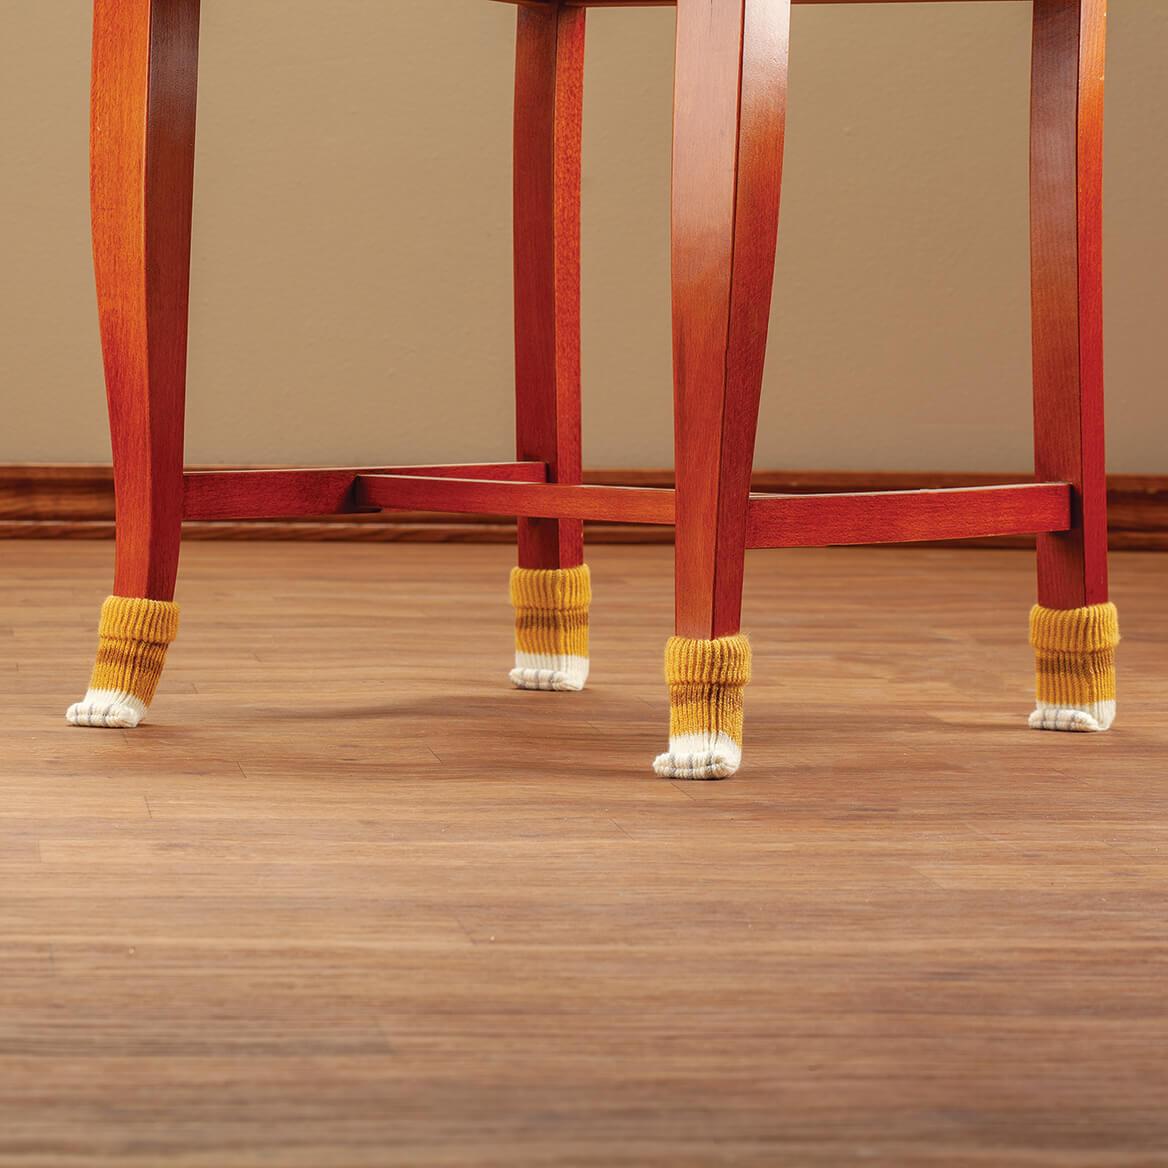 Kitty Chair Feet Socks, Set of 4-371059